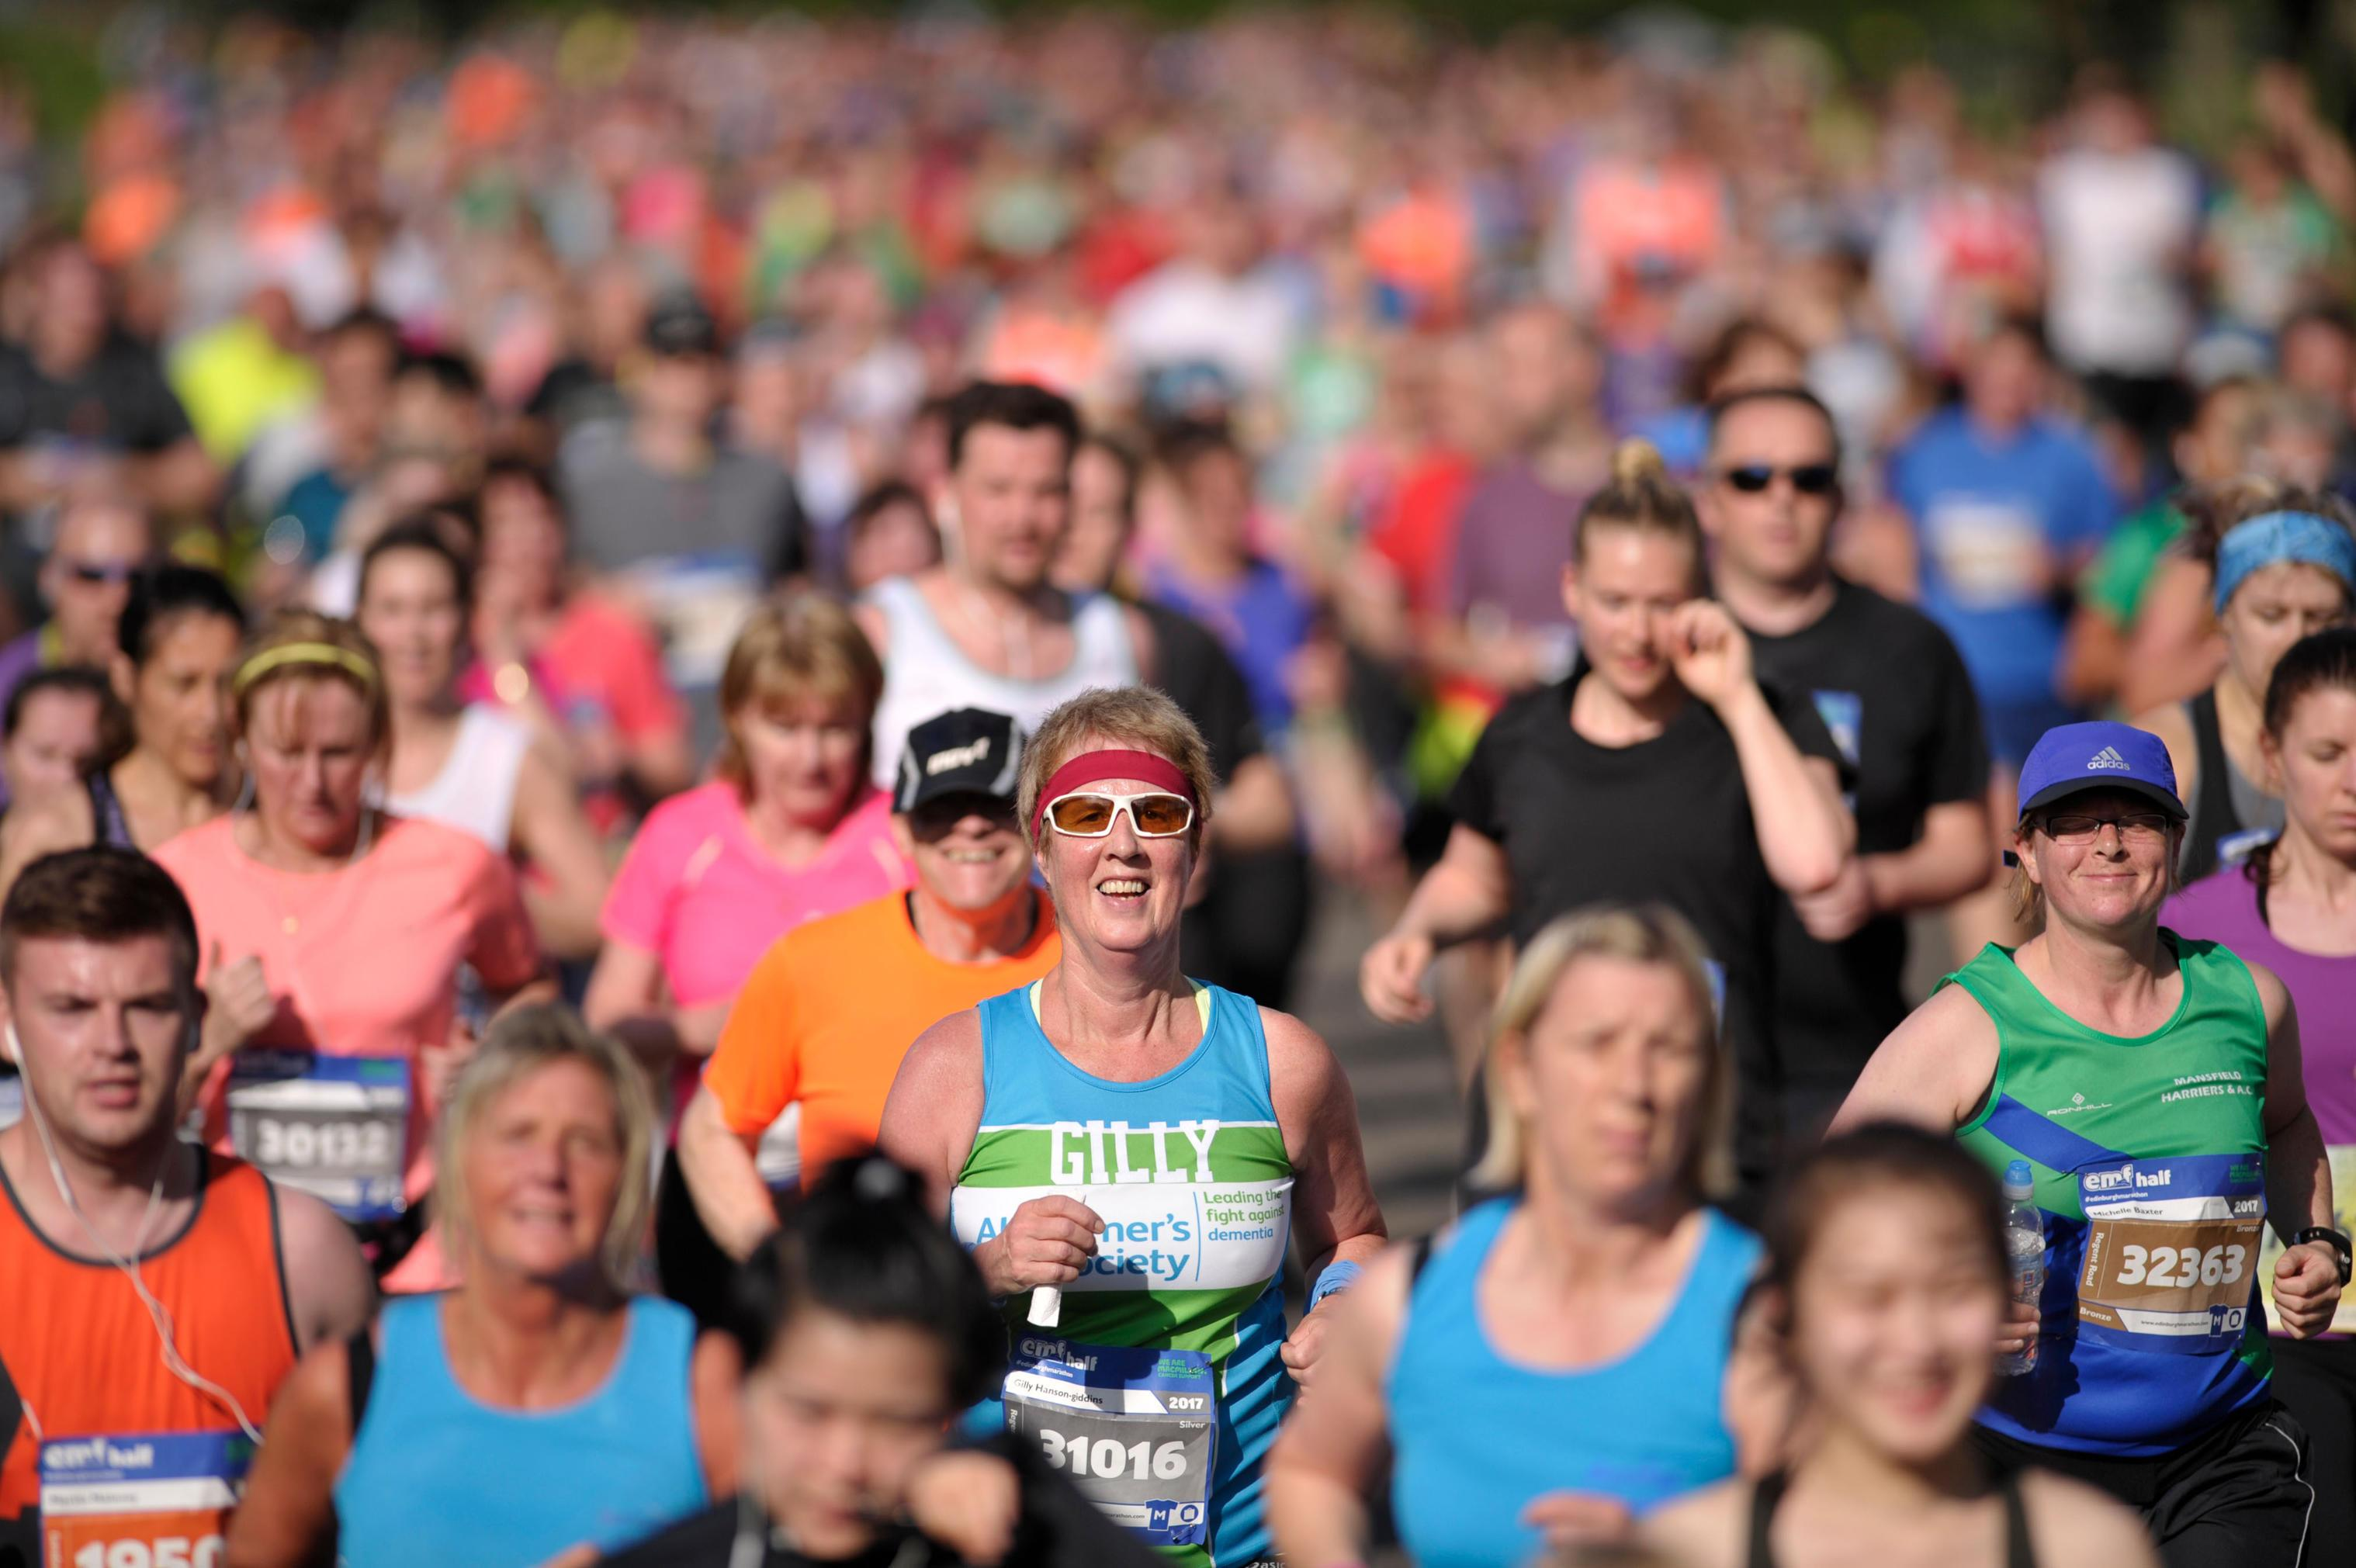 Thousands of runners make their way through Edinburgh for the Edinburgh Marathon Festival